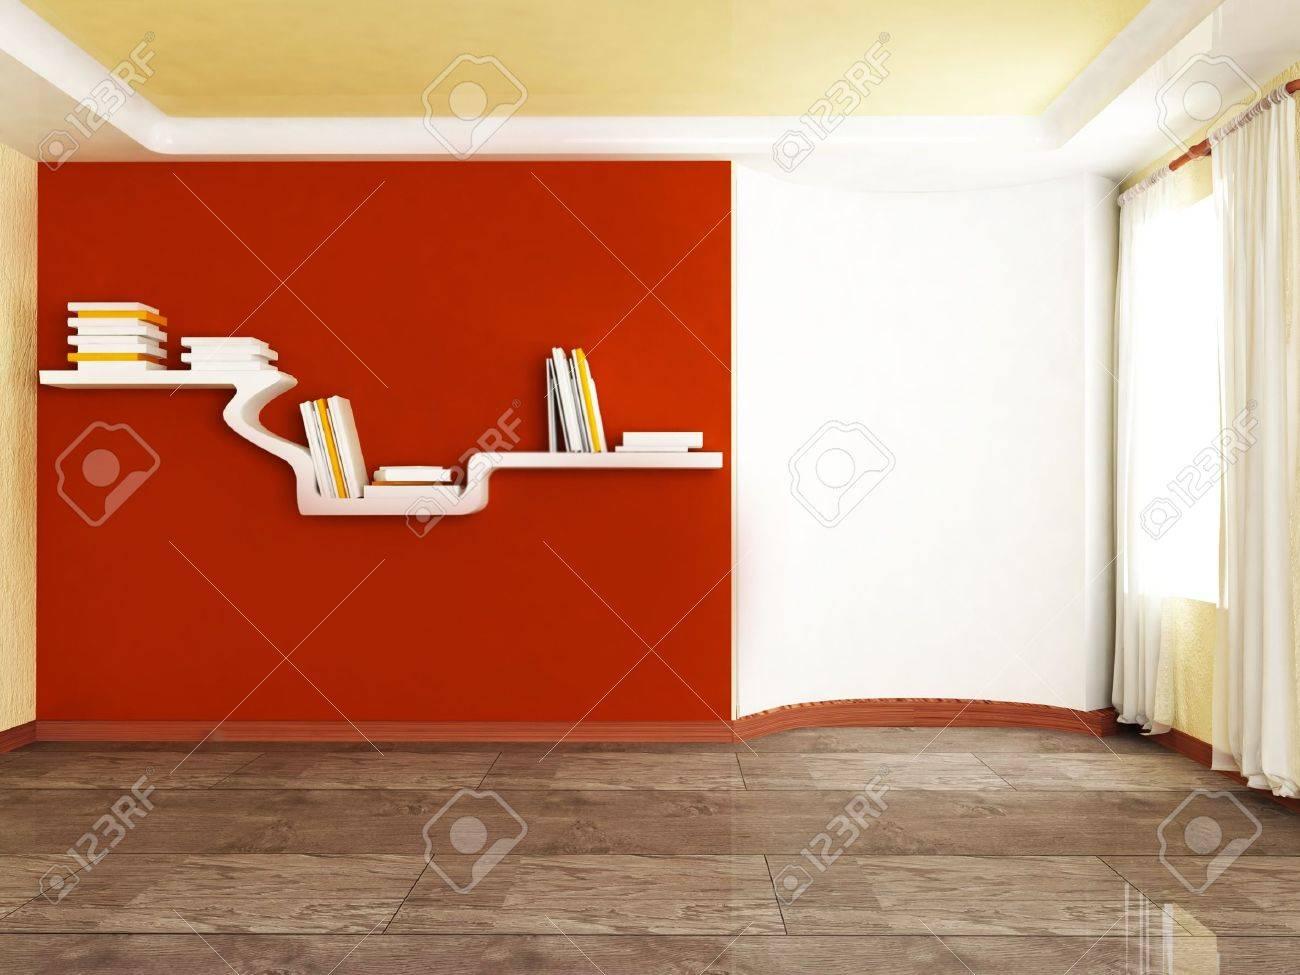 Creative Shelf Interior Design Scene With The Creative Shelf On The Wall Stock